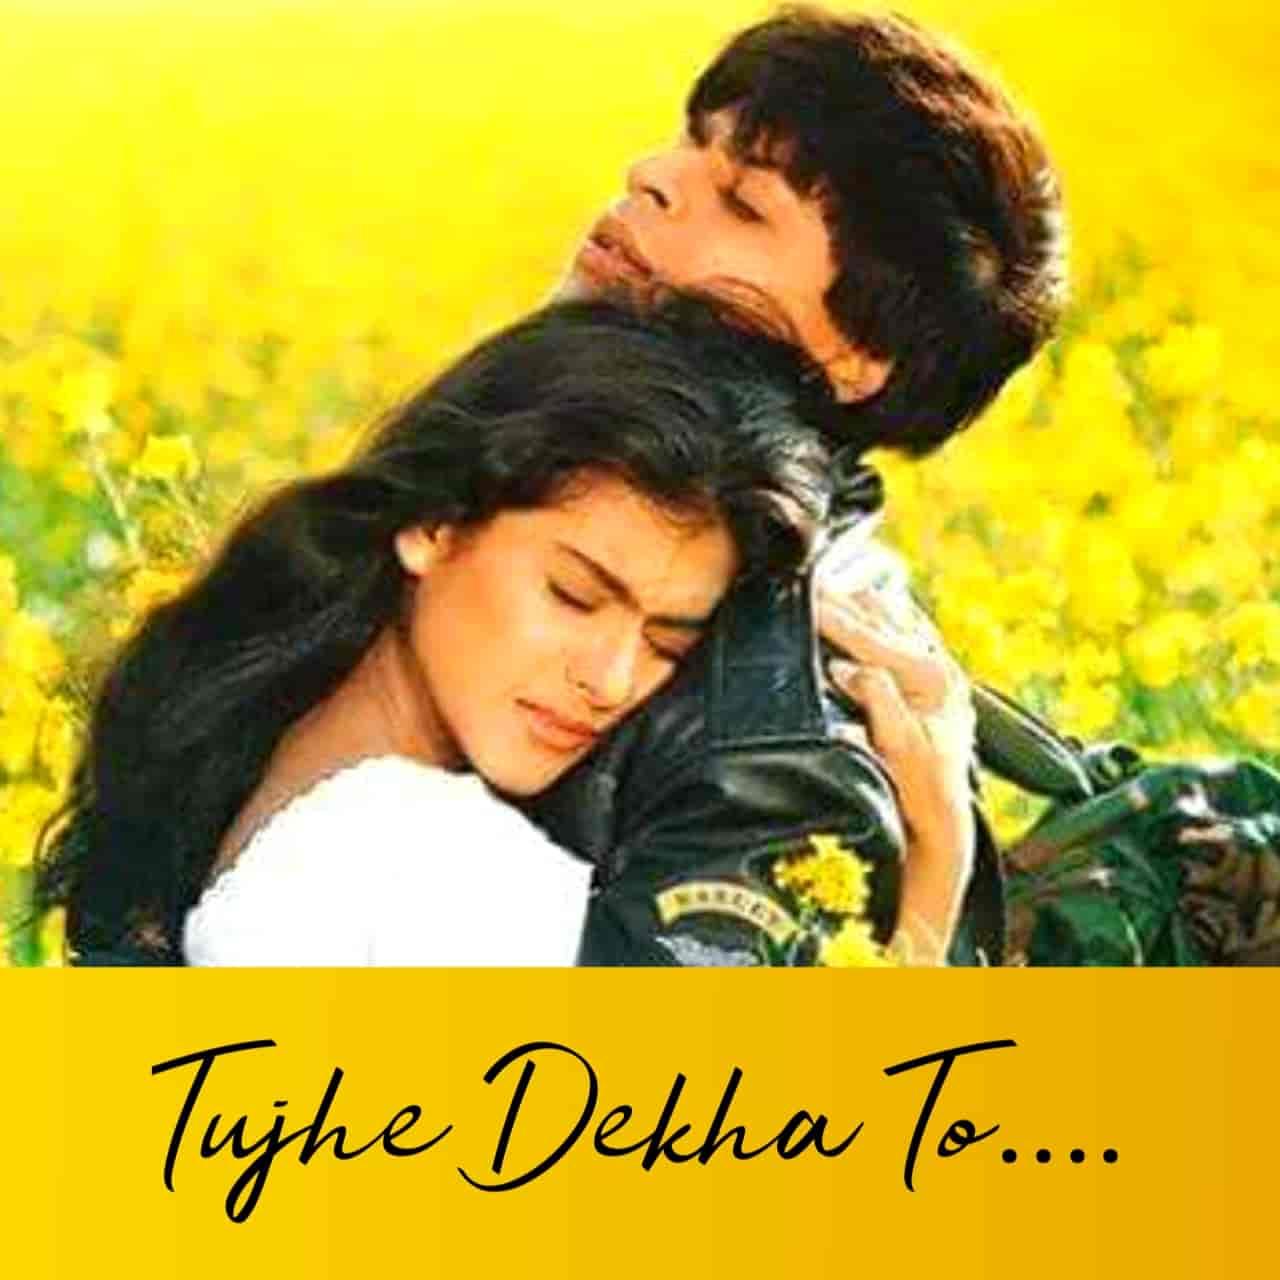 Tujhe Dekha To Hindi Romantic Song Lyrics, Sung By Kumar Sanu.